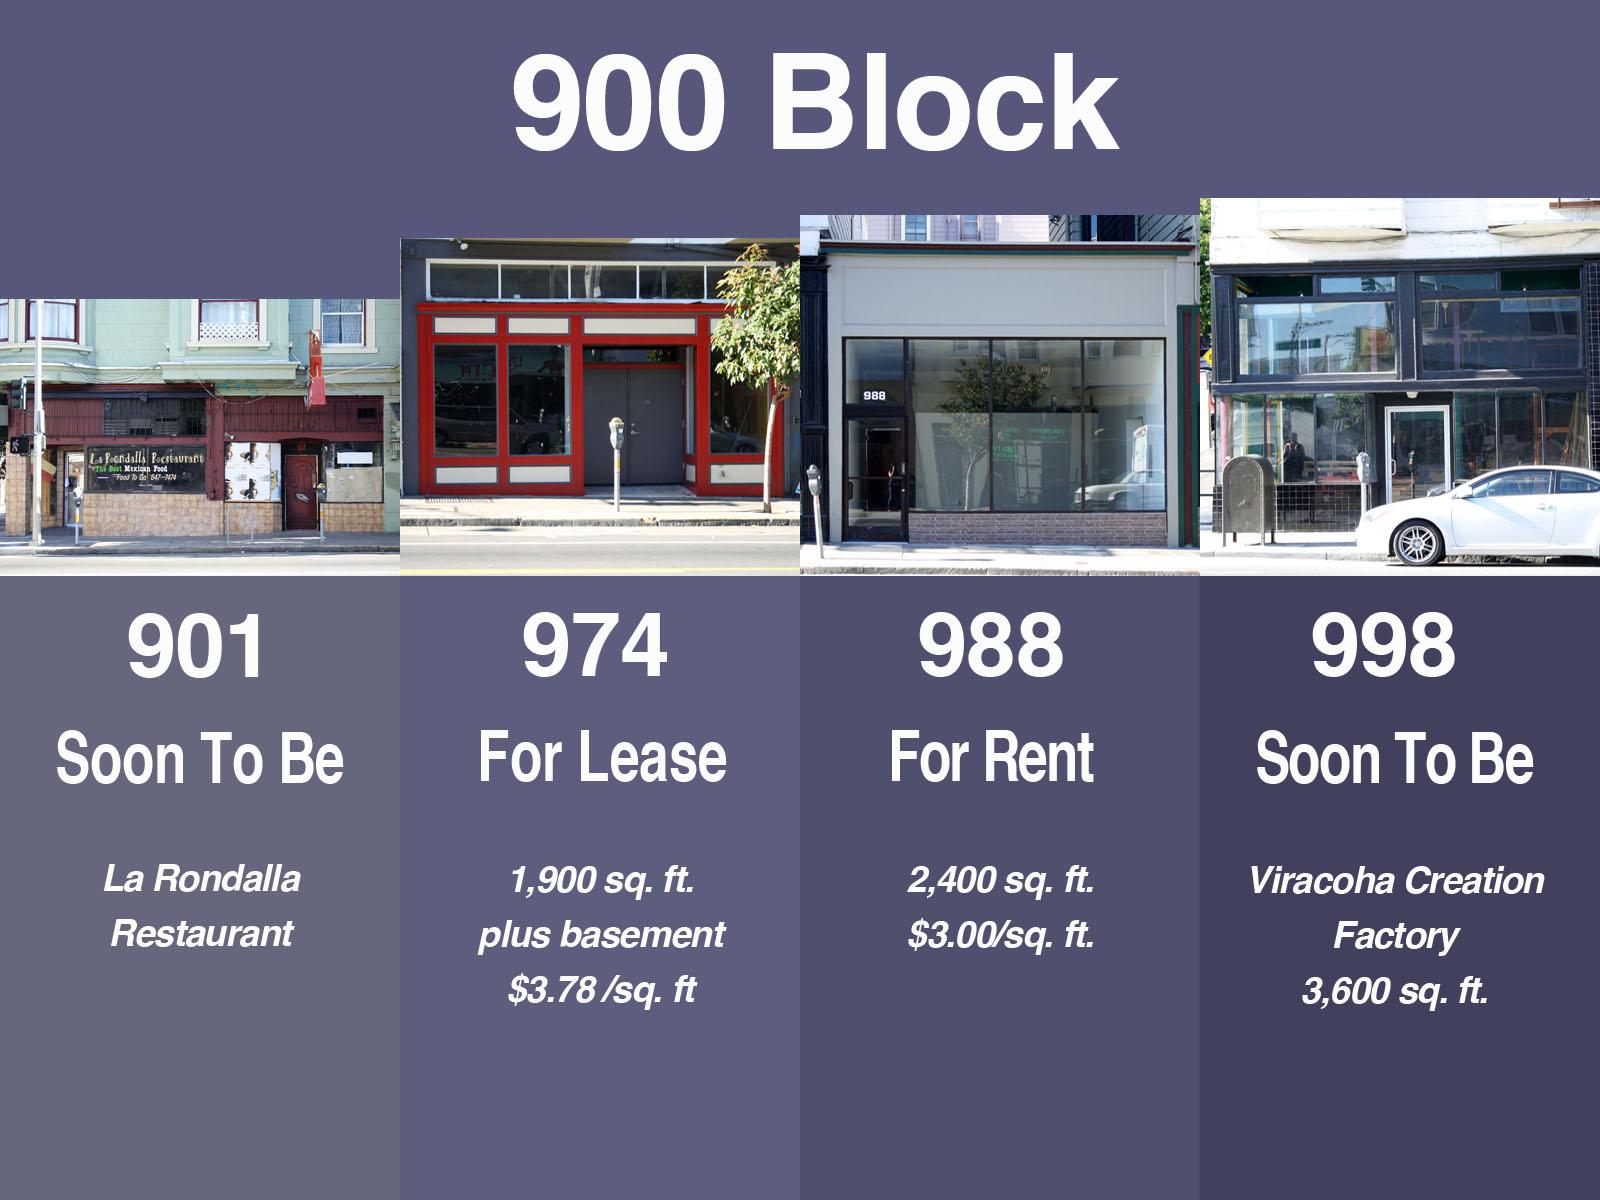 900 Block